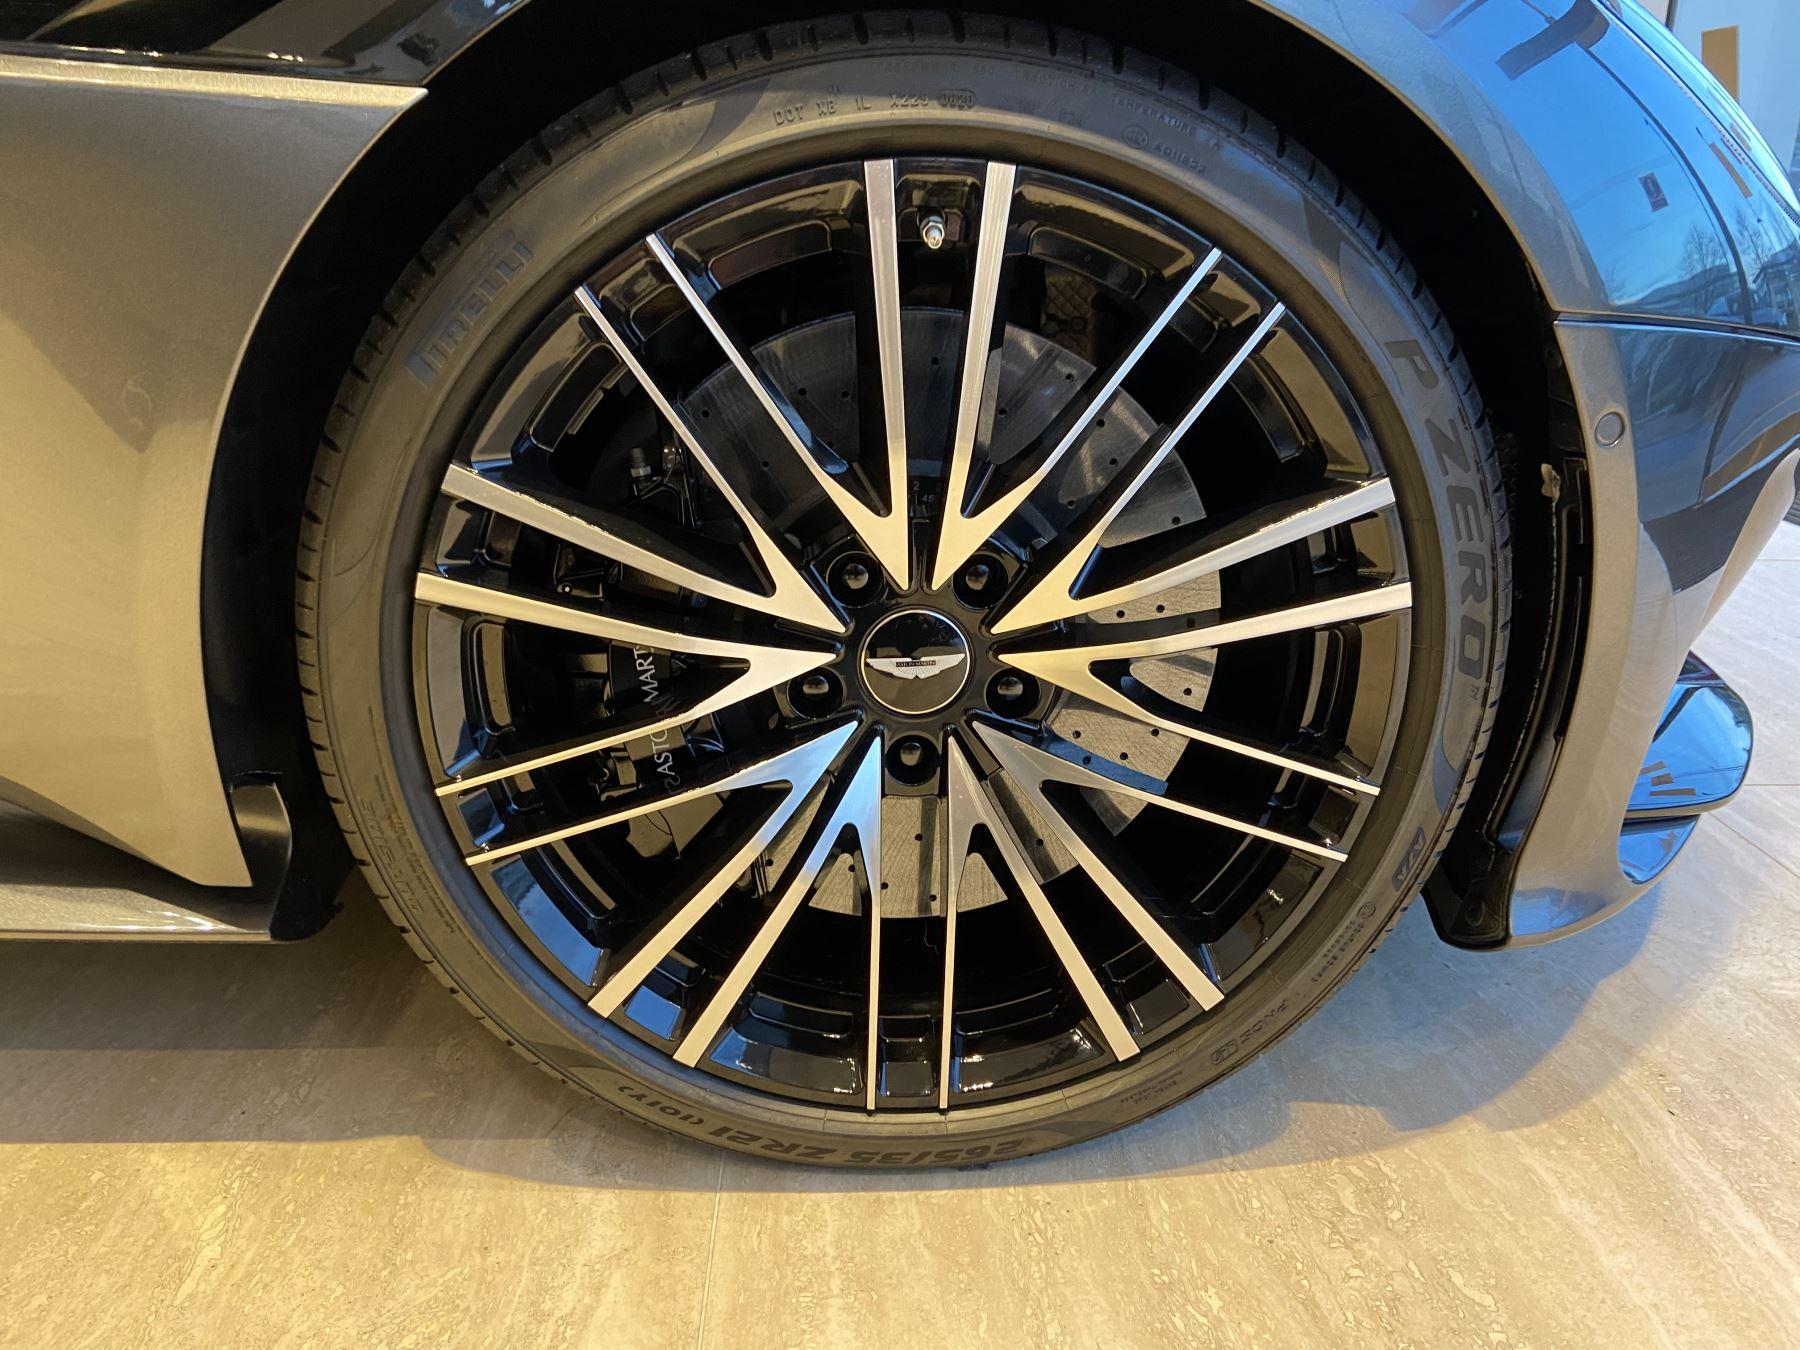 Aston Martin DBS V12 Superleggera Volante Touchtronic image 6